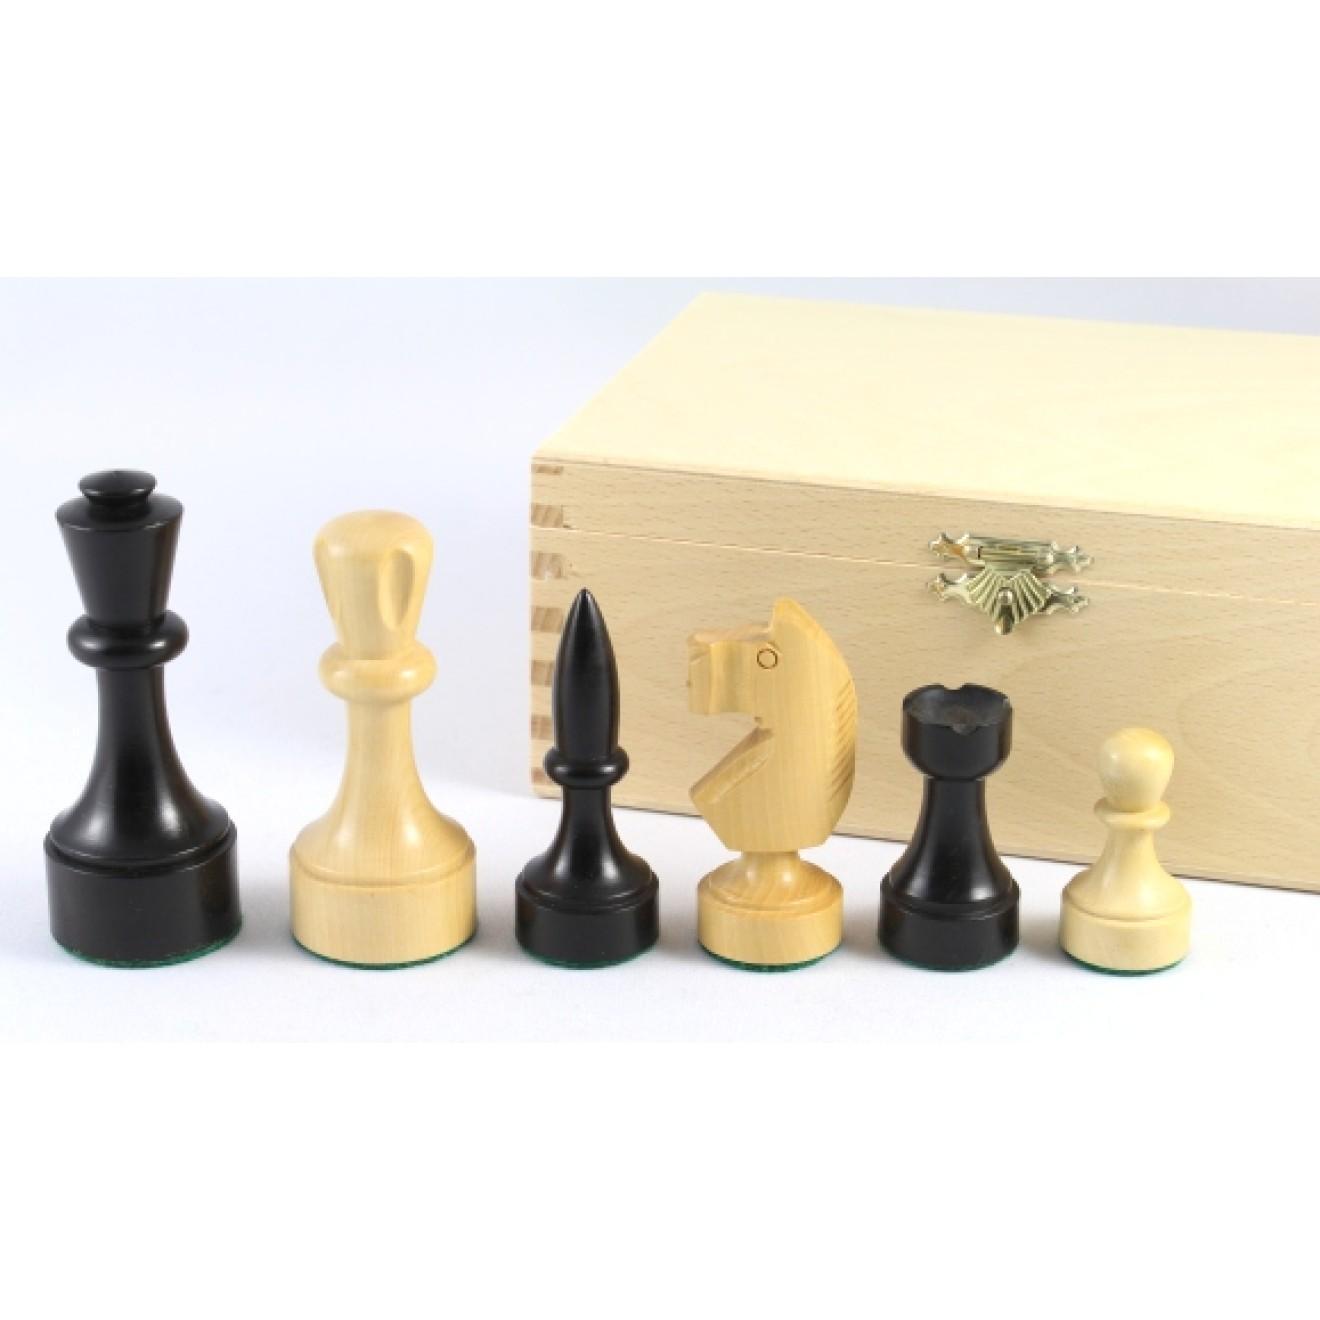 schach set paramo turnament. Black Bedroom Furniture Sets. Home Design Ideas